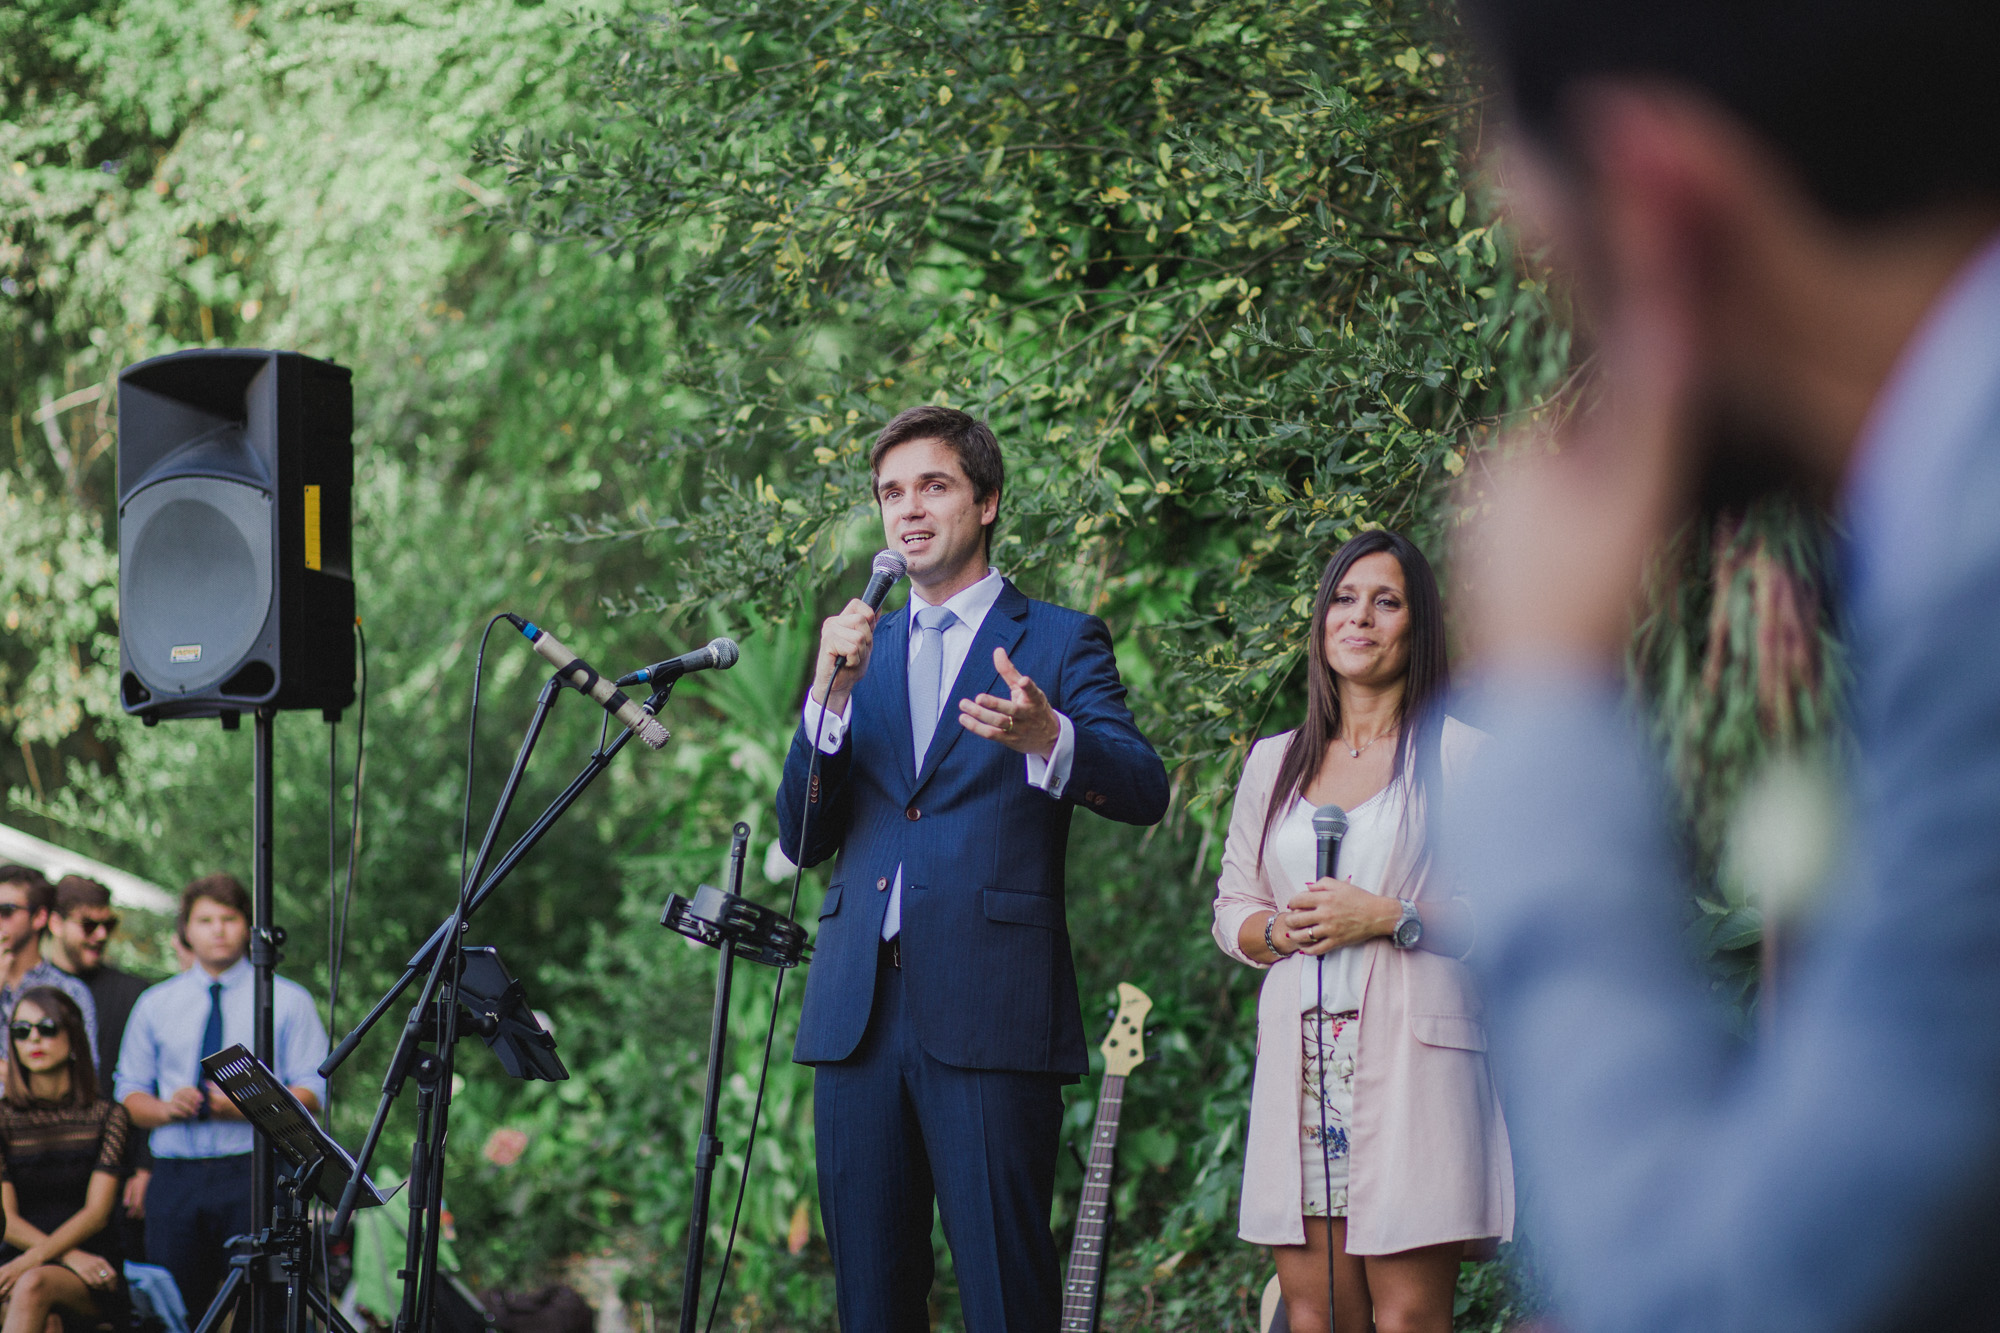 054-carina-e-samuel-wedding-casamento-quinta-dos-rouxinois-rustico-my-fancy-wedding-mafra-malveira-lisboa-sintra-cascais-filipe-santiago-fotografia-fotografo-lifestyle-destination-portugal